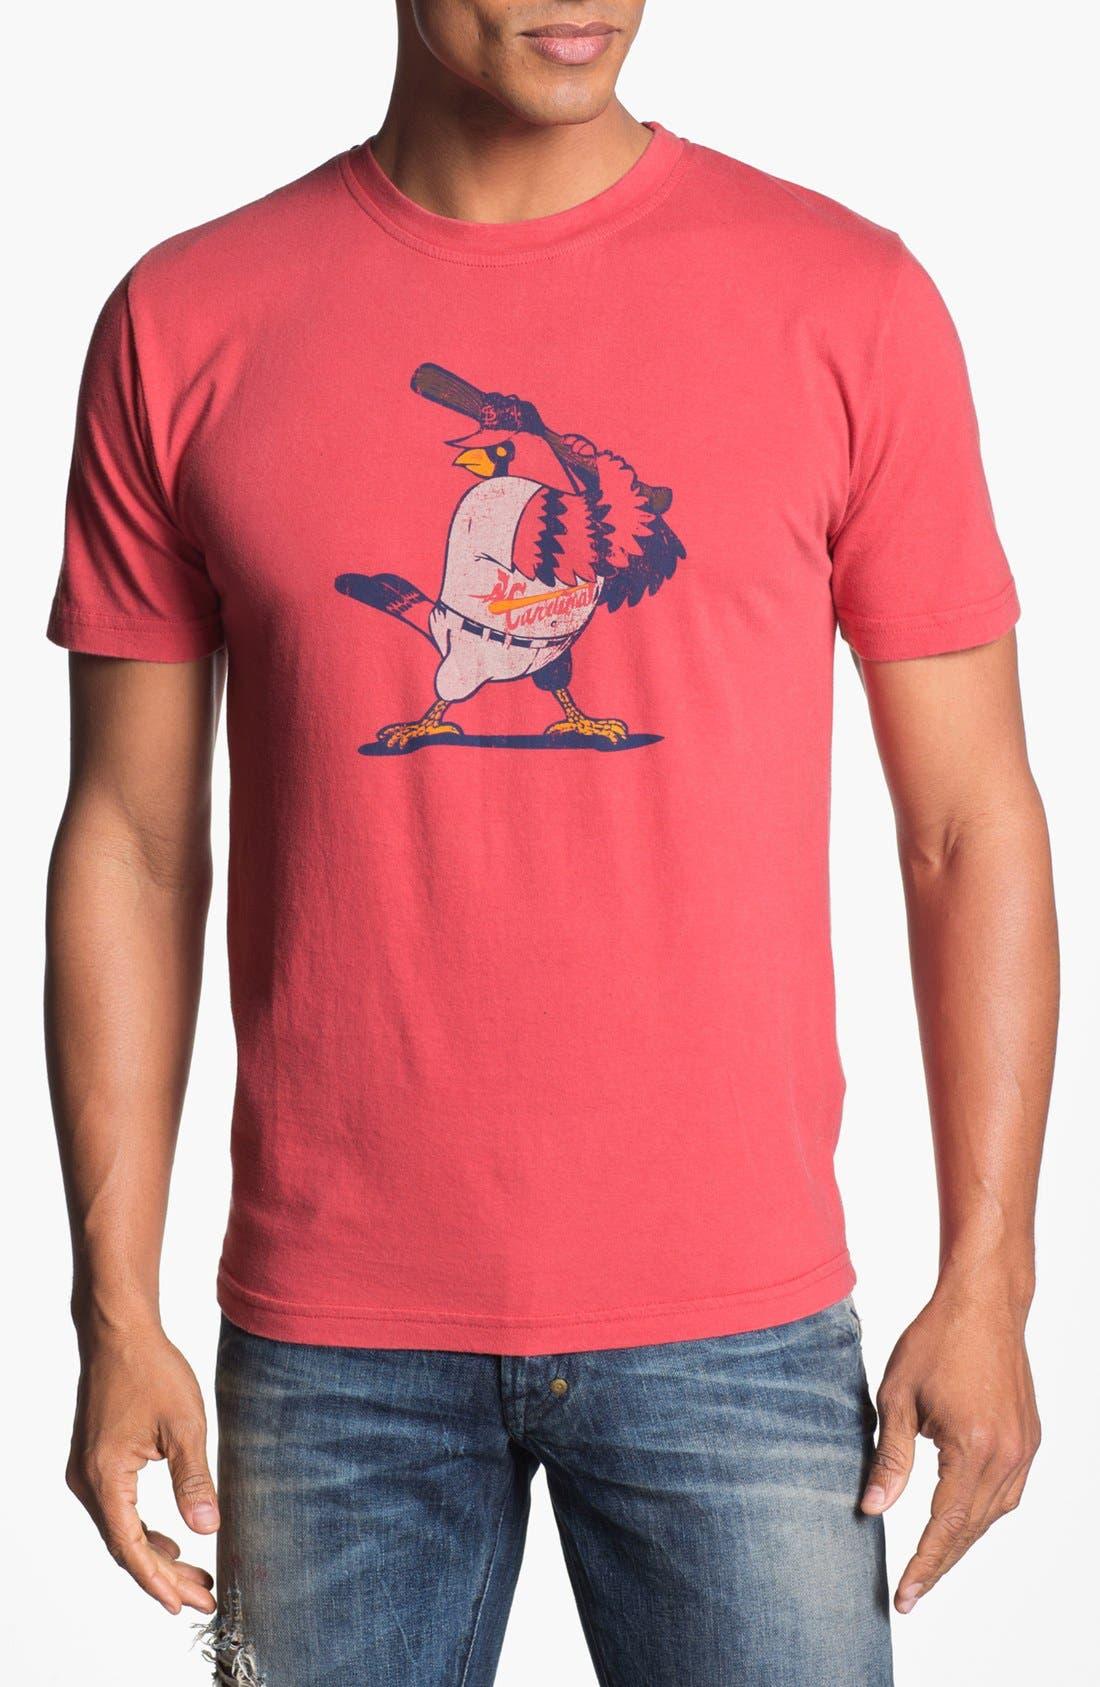 Red Jacket 'St. Louis Cardinals' Regular Fit Crewneck T-Shirt (Men)